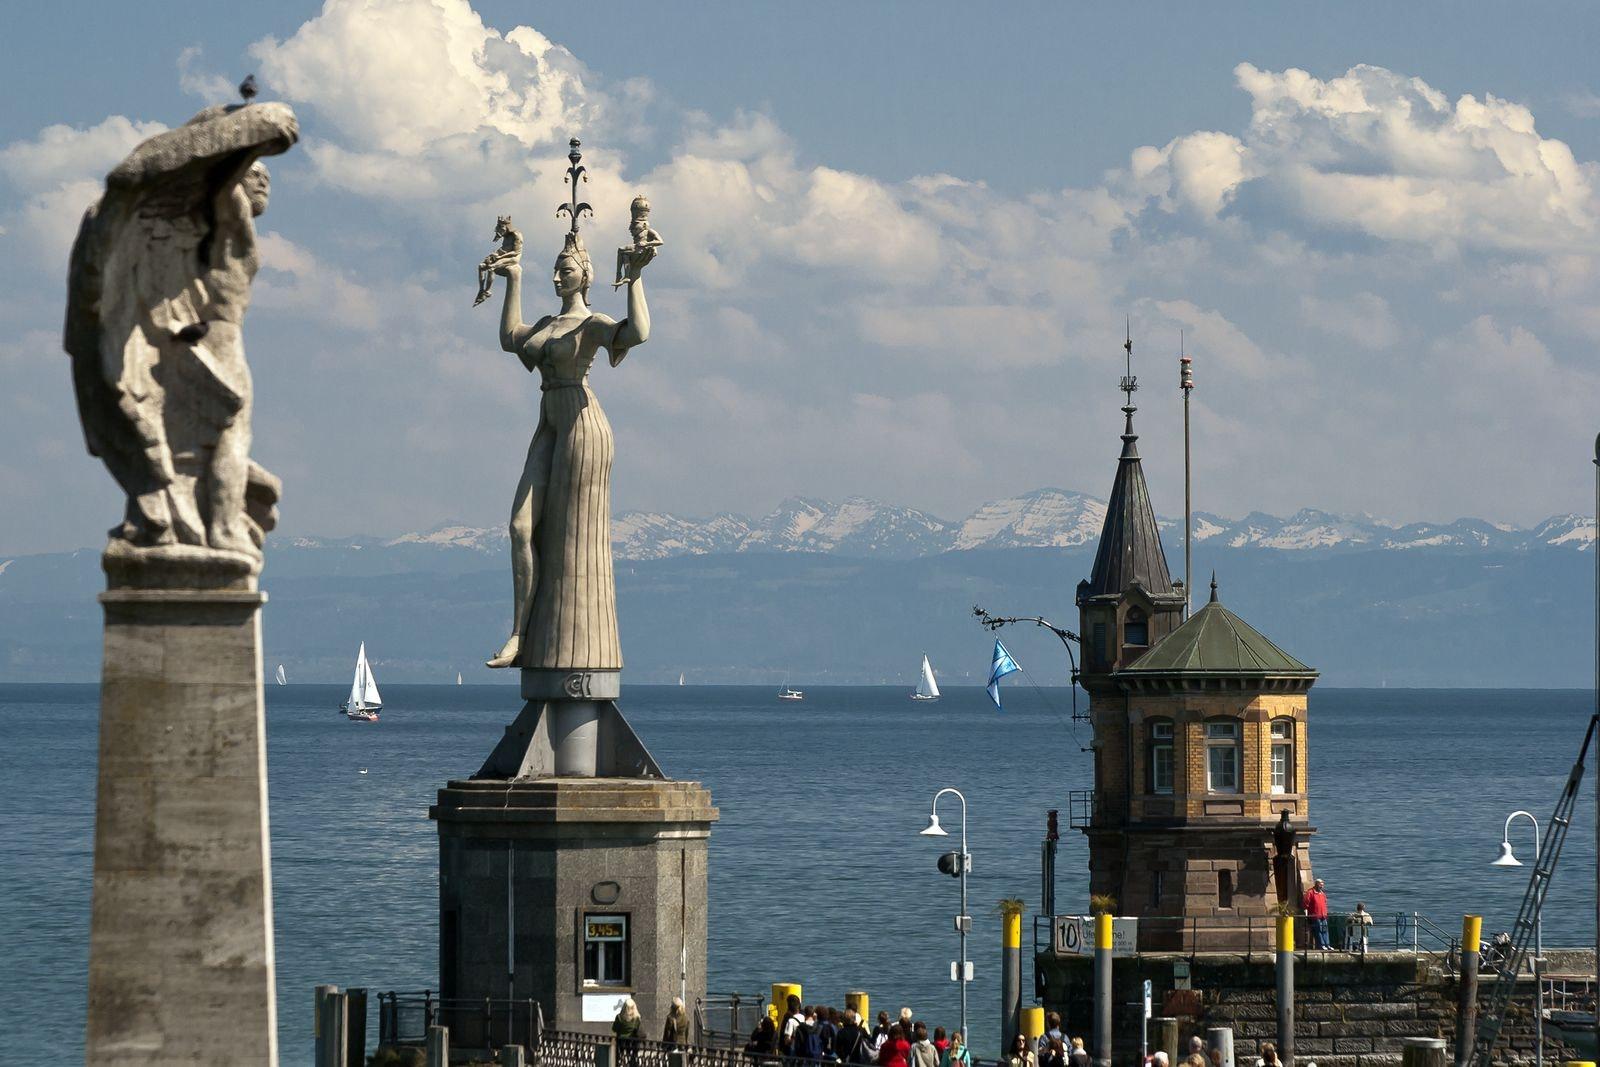 5-daagse fietsvakantie Bodensee - sportief